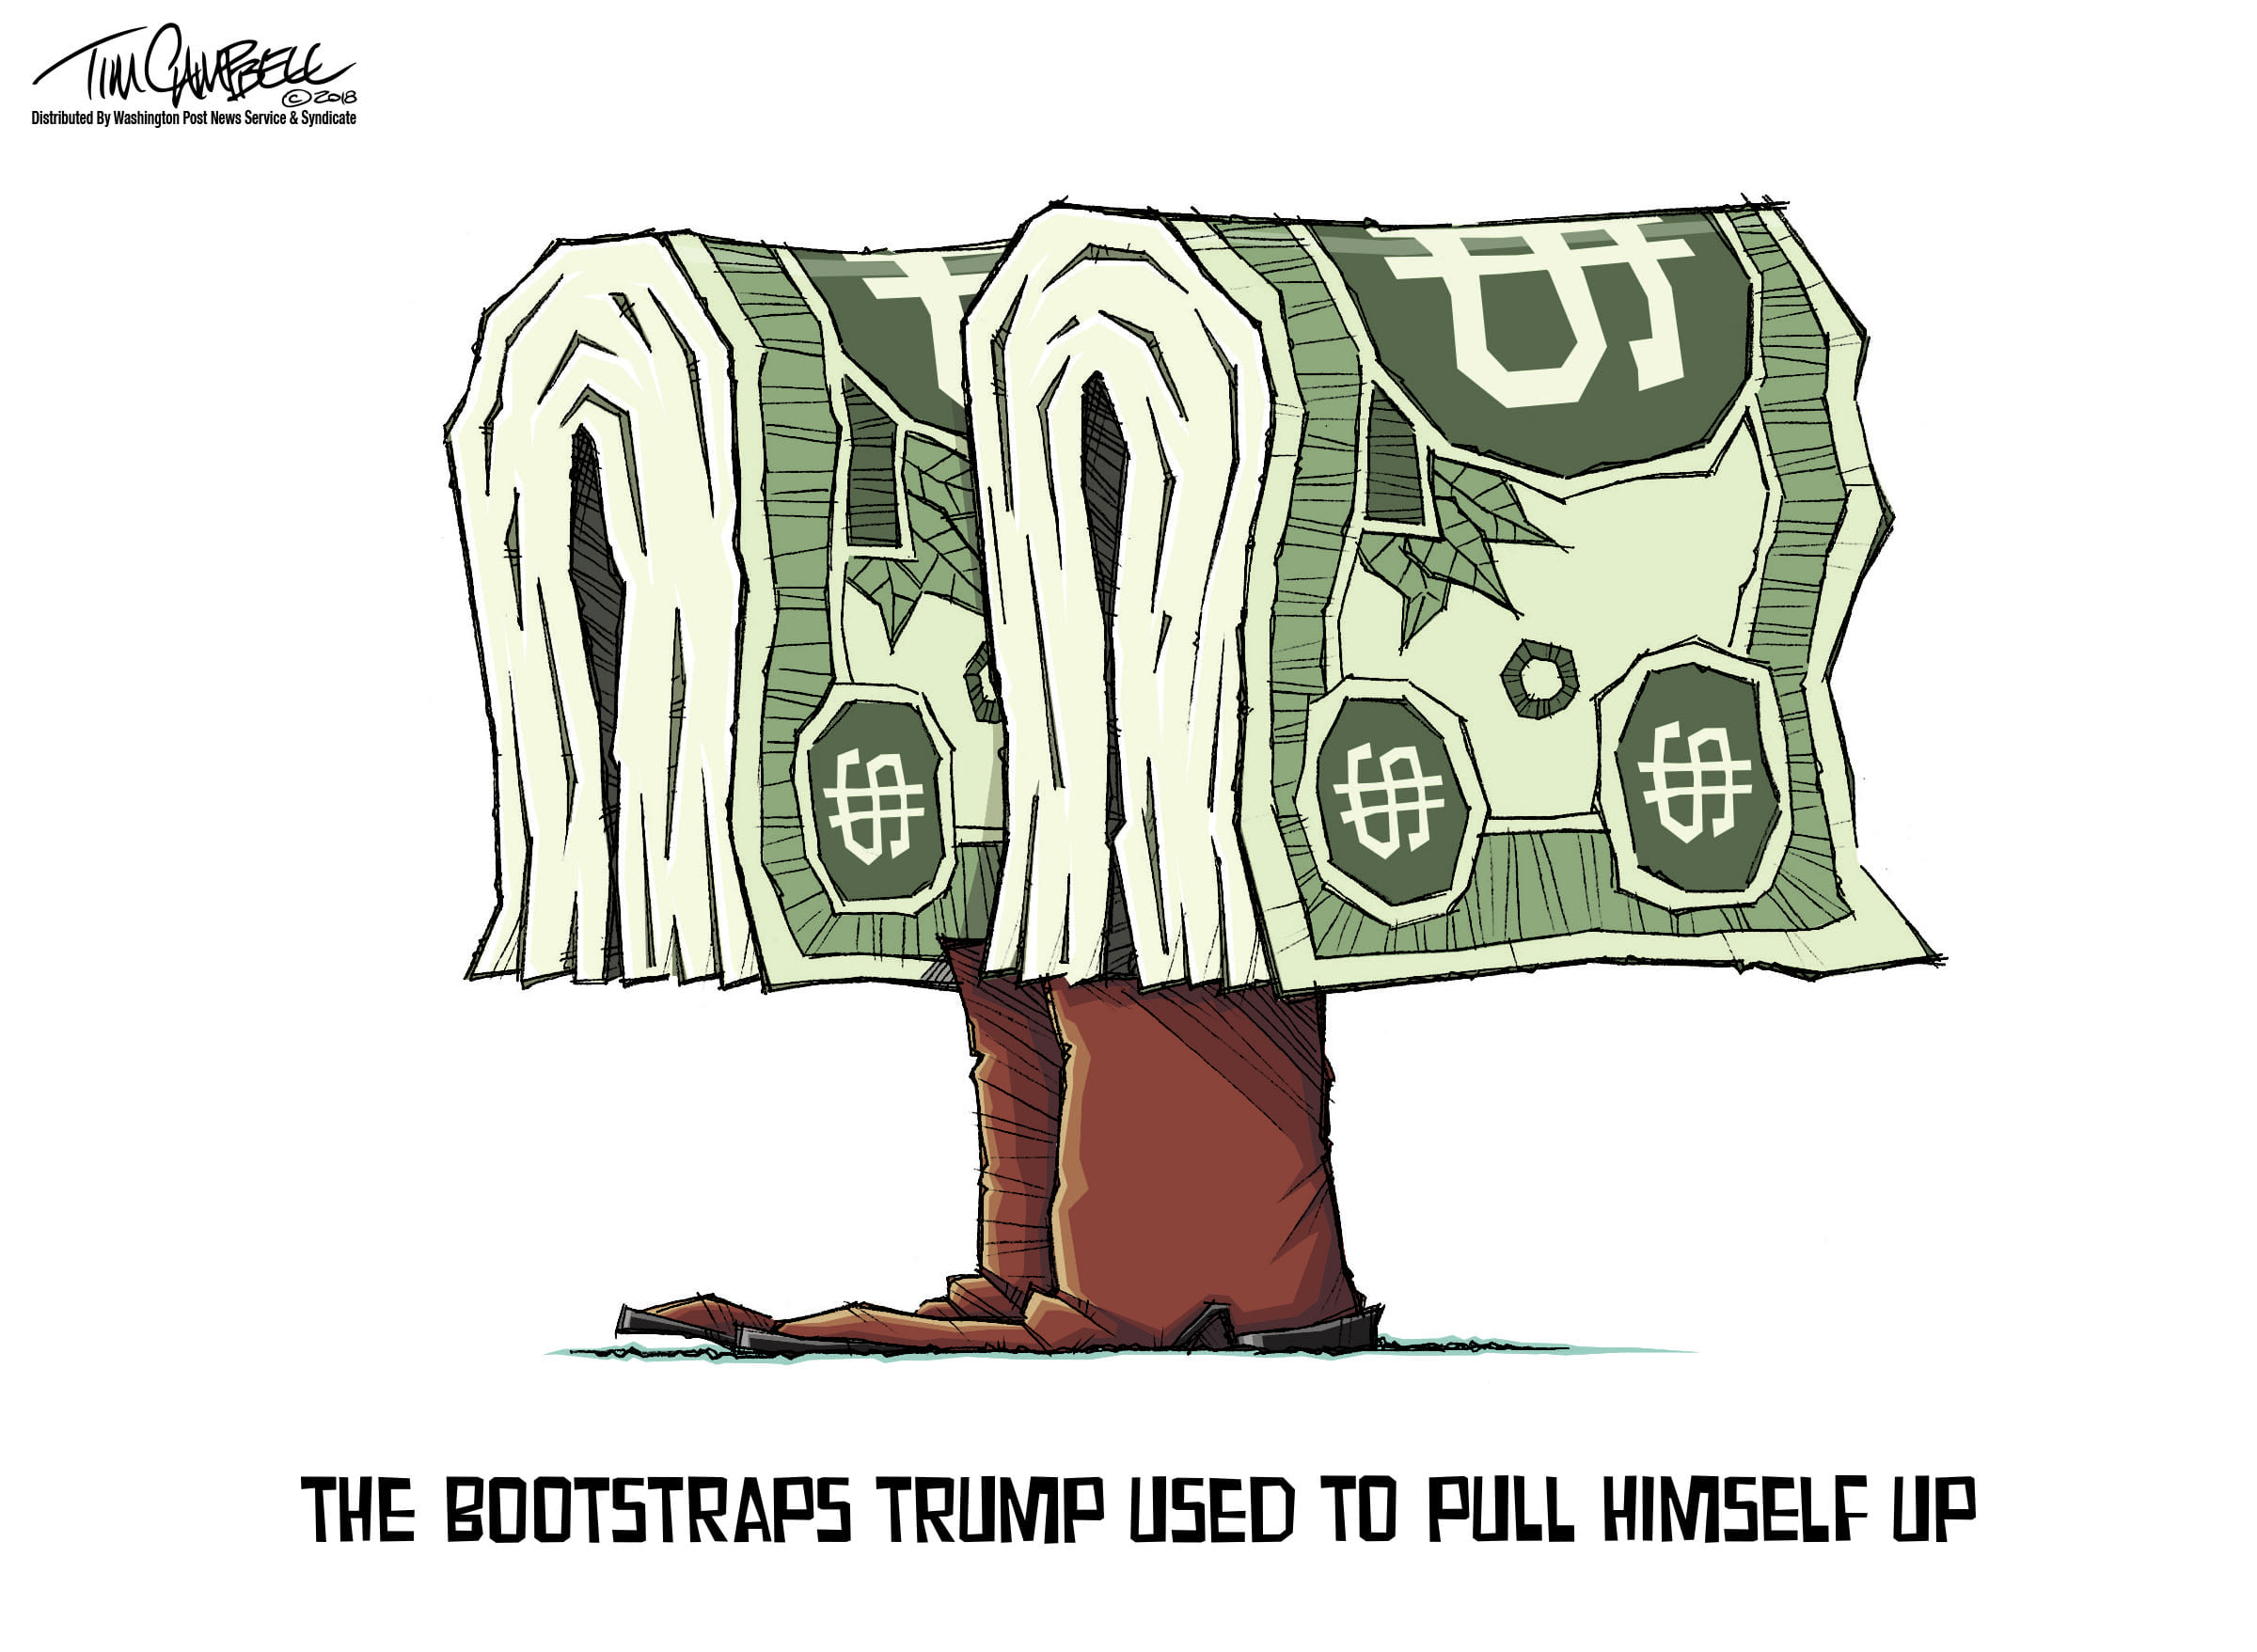 Oct. 6: Trump Bootstraps